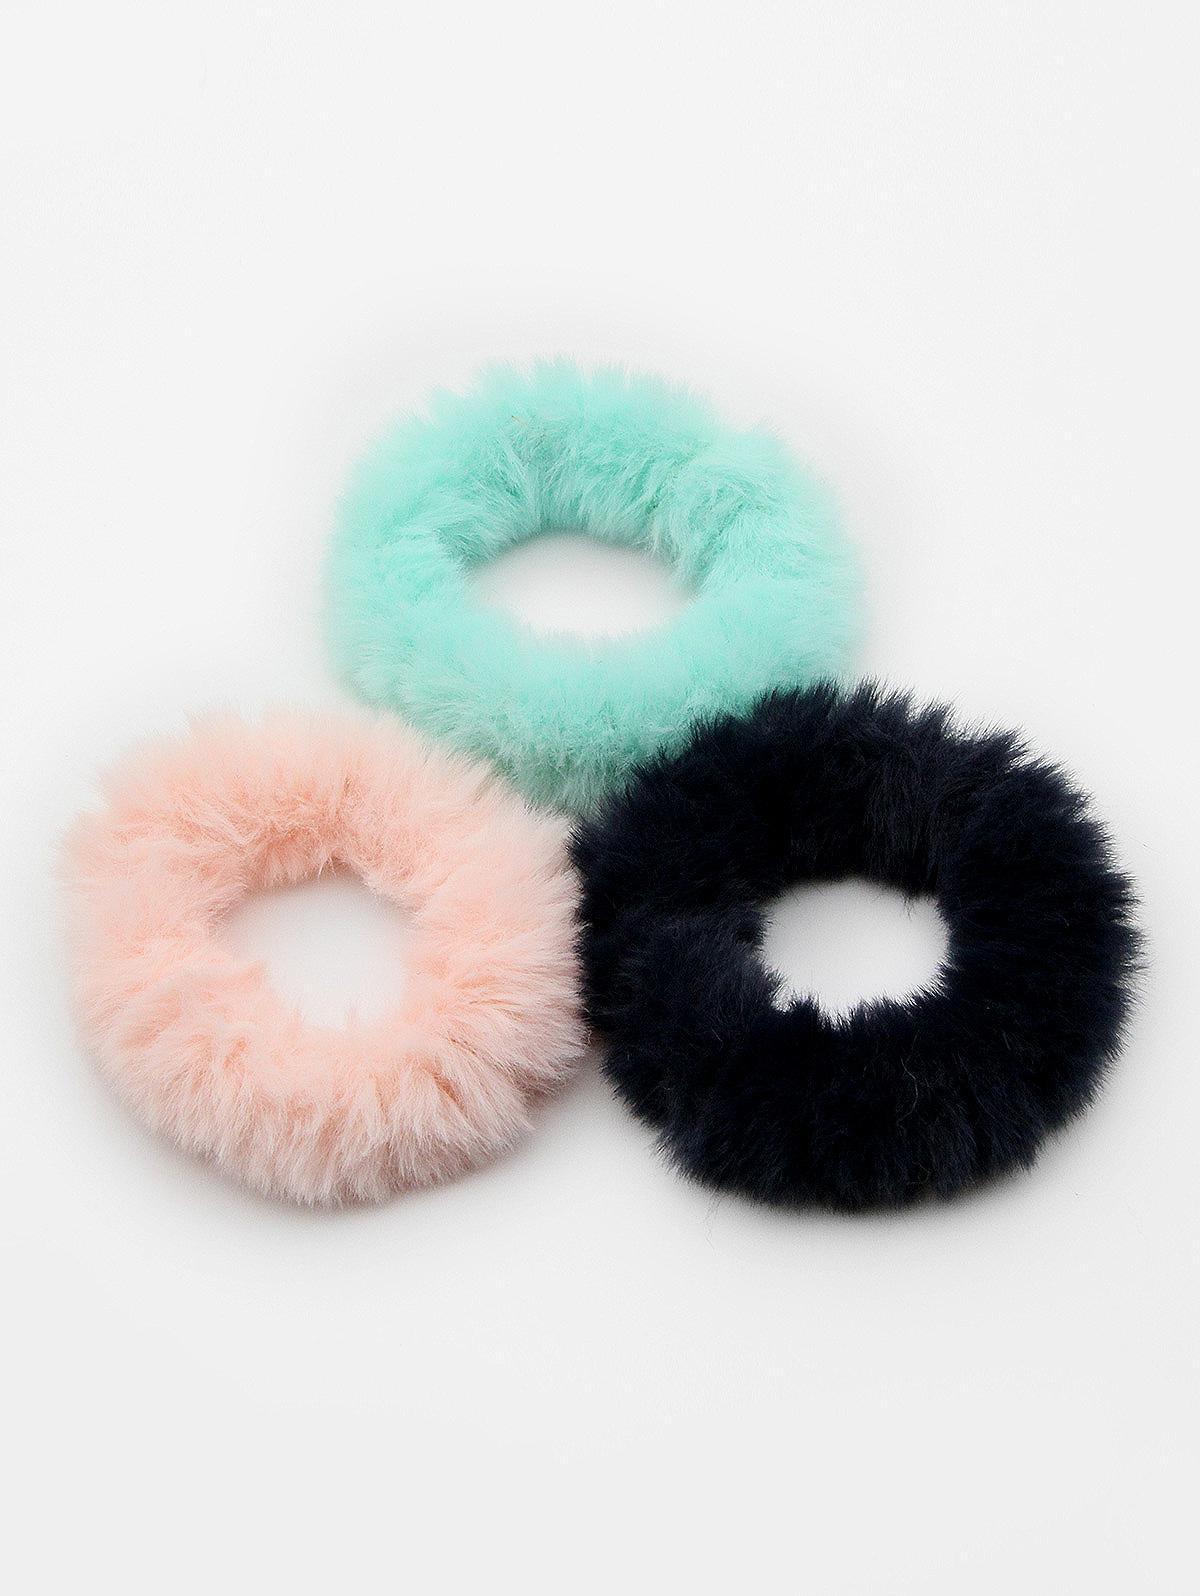 3 Pcs Cute Faux Fur Ponytail Hair Band